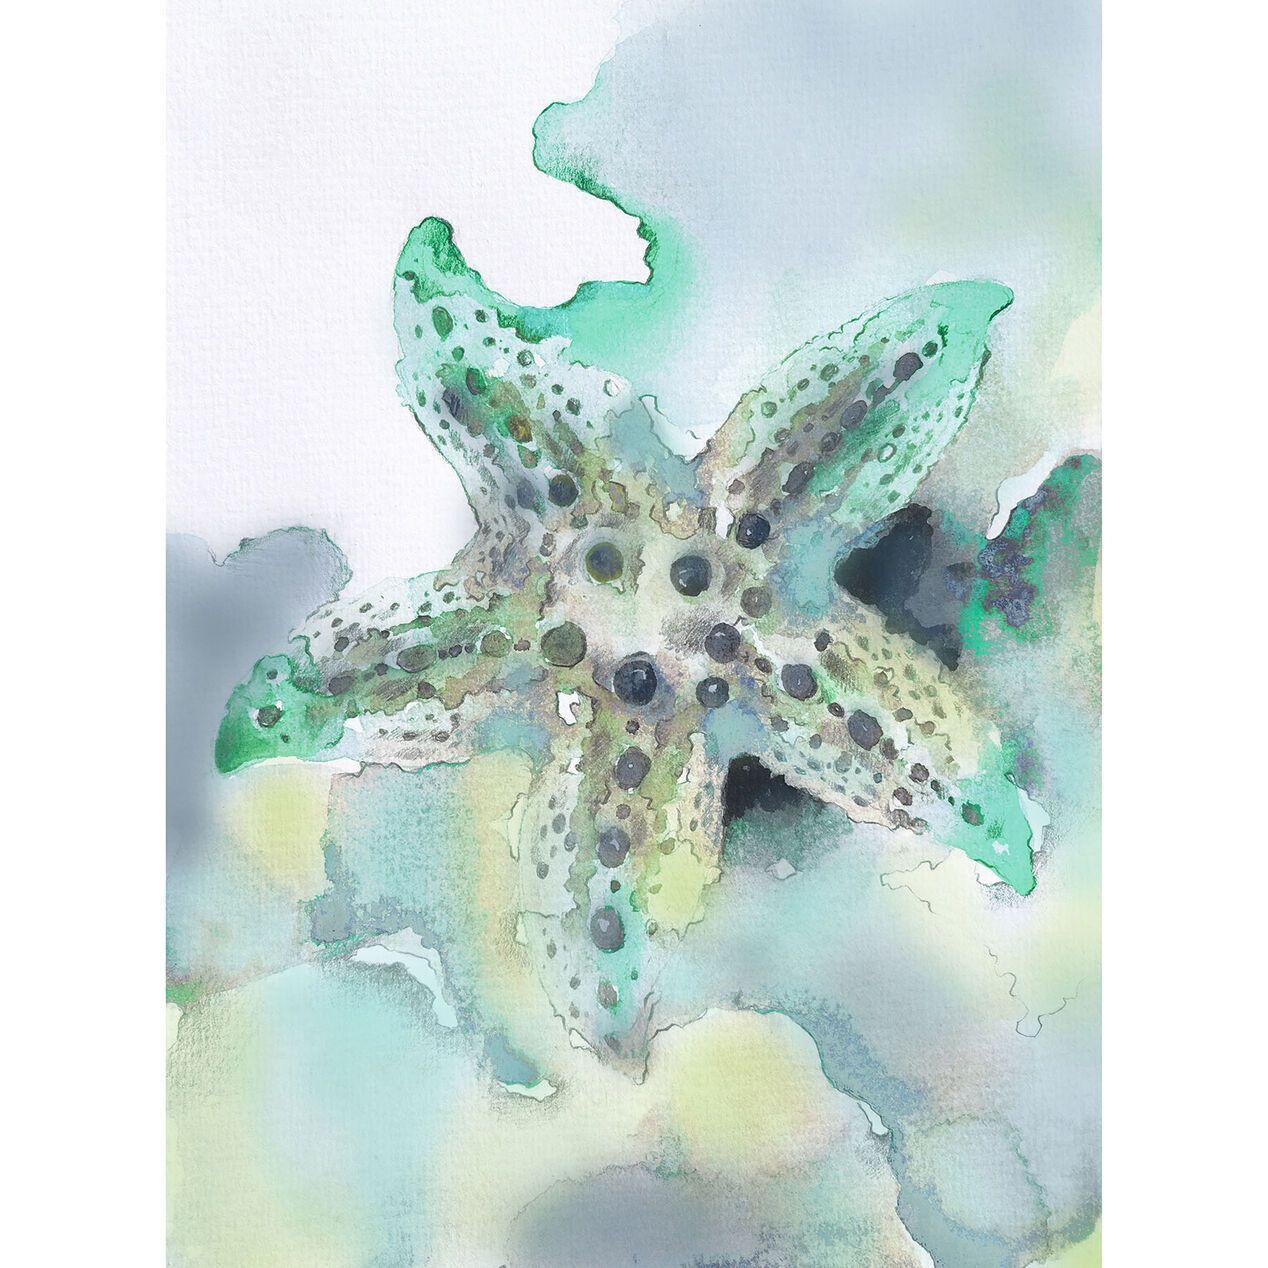 Starfish Outdoor Canvas Wall Art 20 X 24 At Home Outdoor Canvas Starfish Wall Art Canvas Wall Art